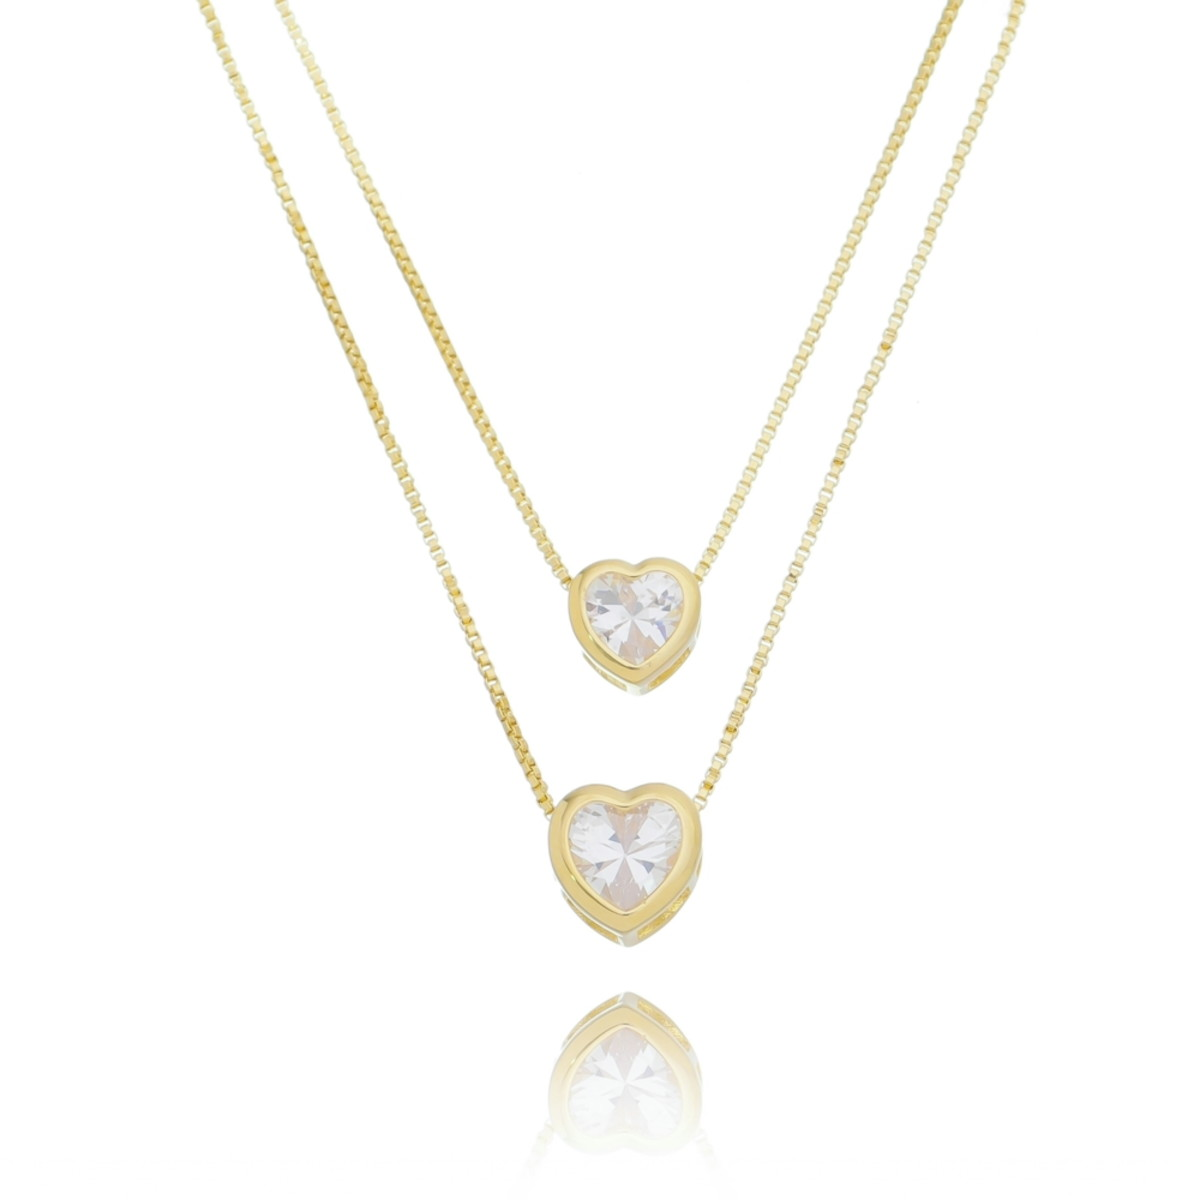 0405c9f296b5d Colar Duplo Coração Cristal Semi Joia no Elo7